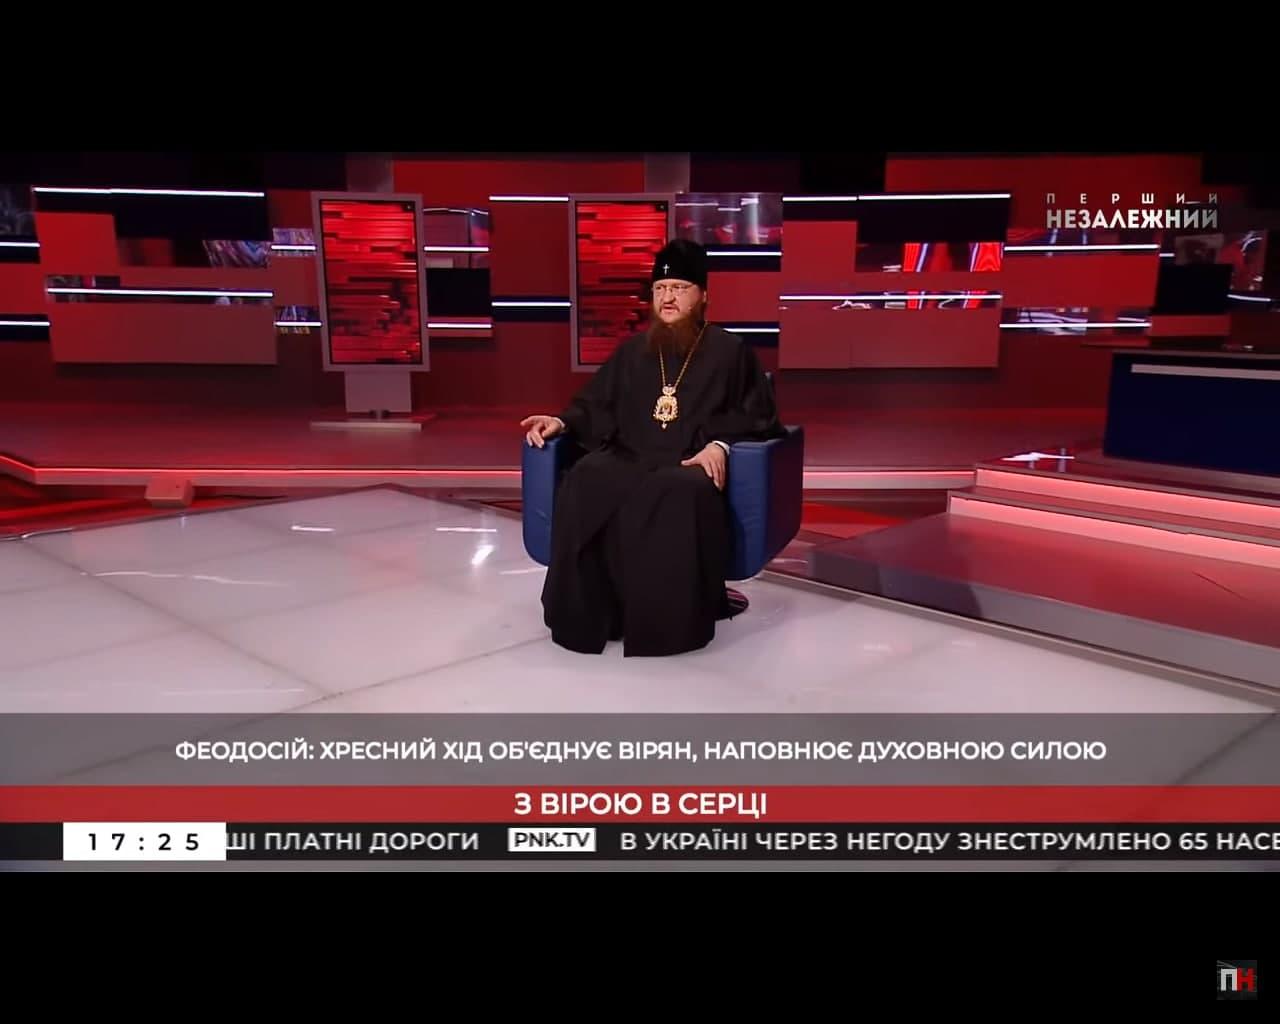 Архиепископ Феодосий в ток-шоу «Украинский формат» (ВИДЕО)